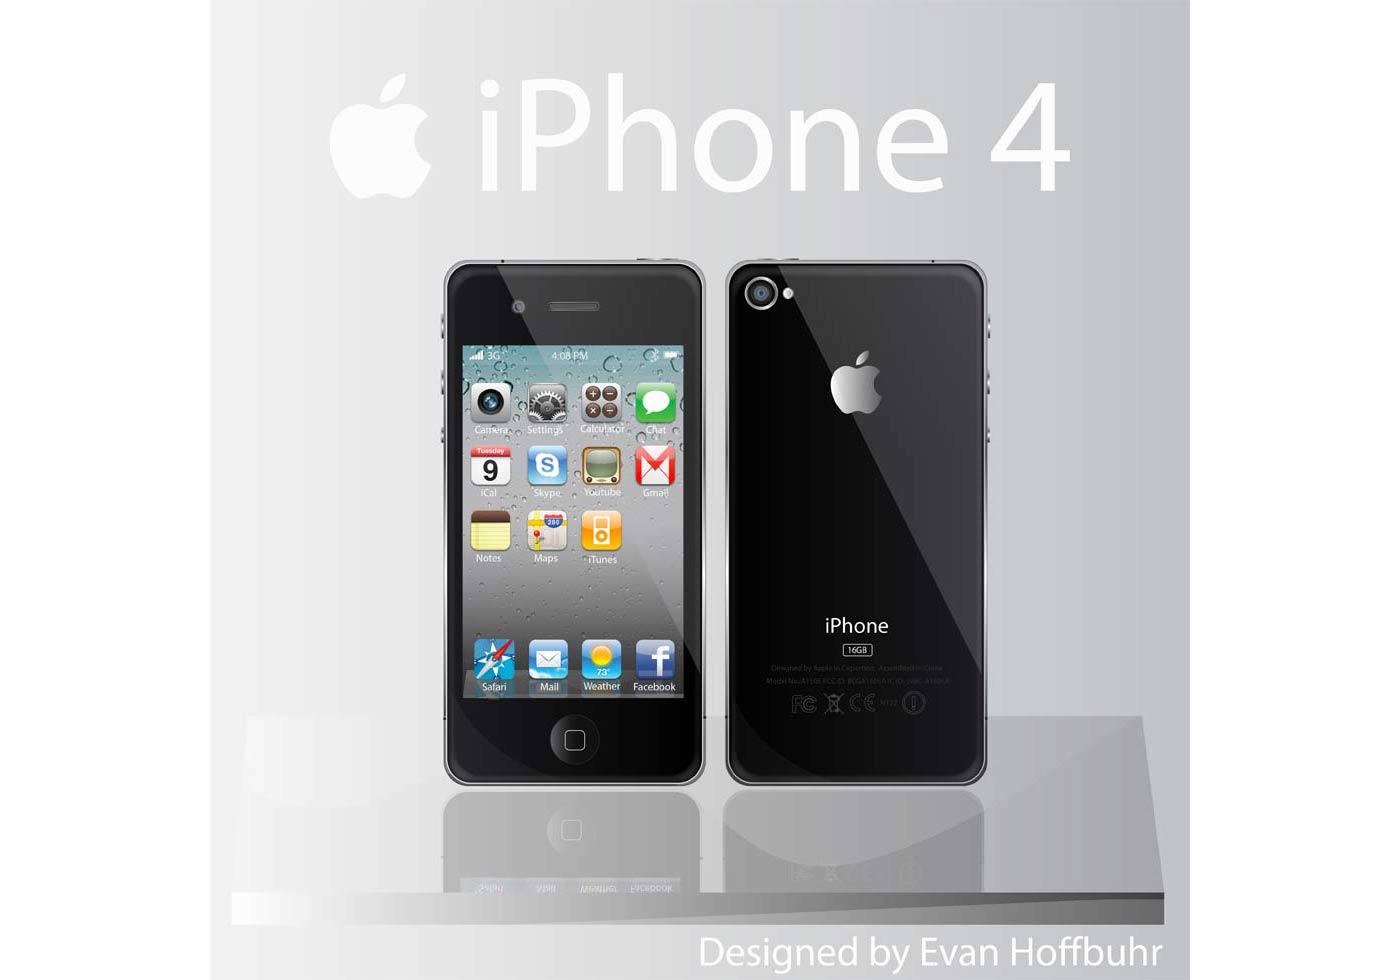 Ringsignaler iphone 4 gratis